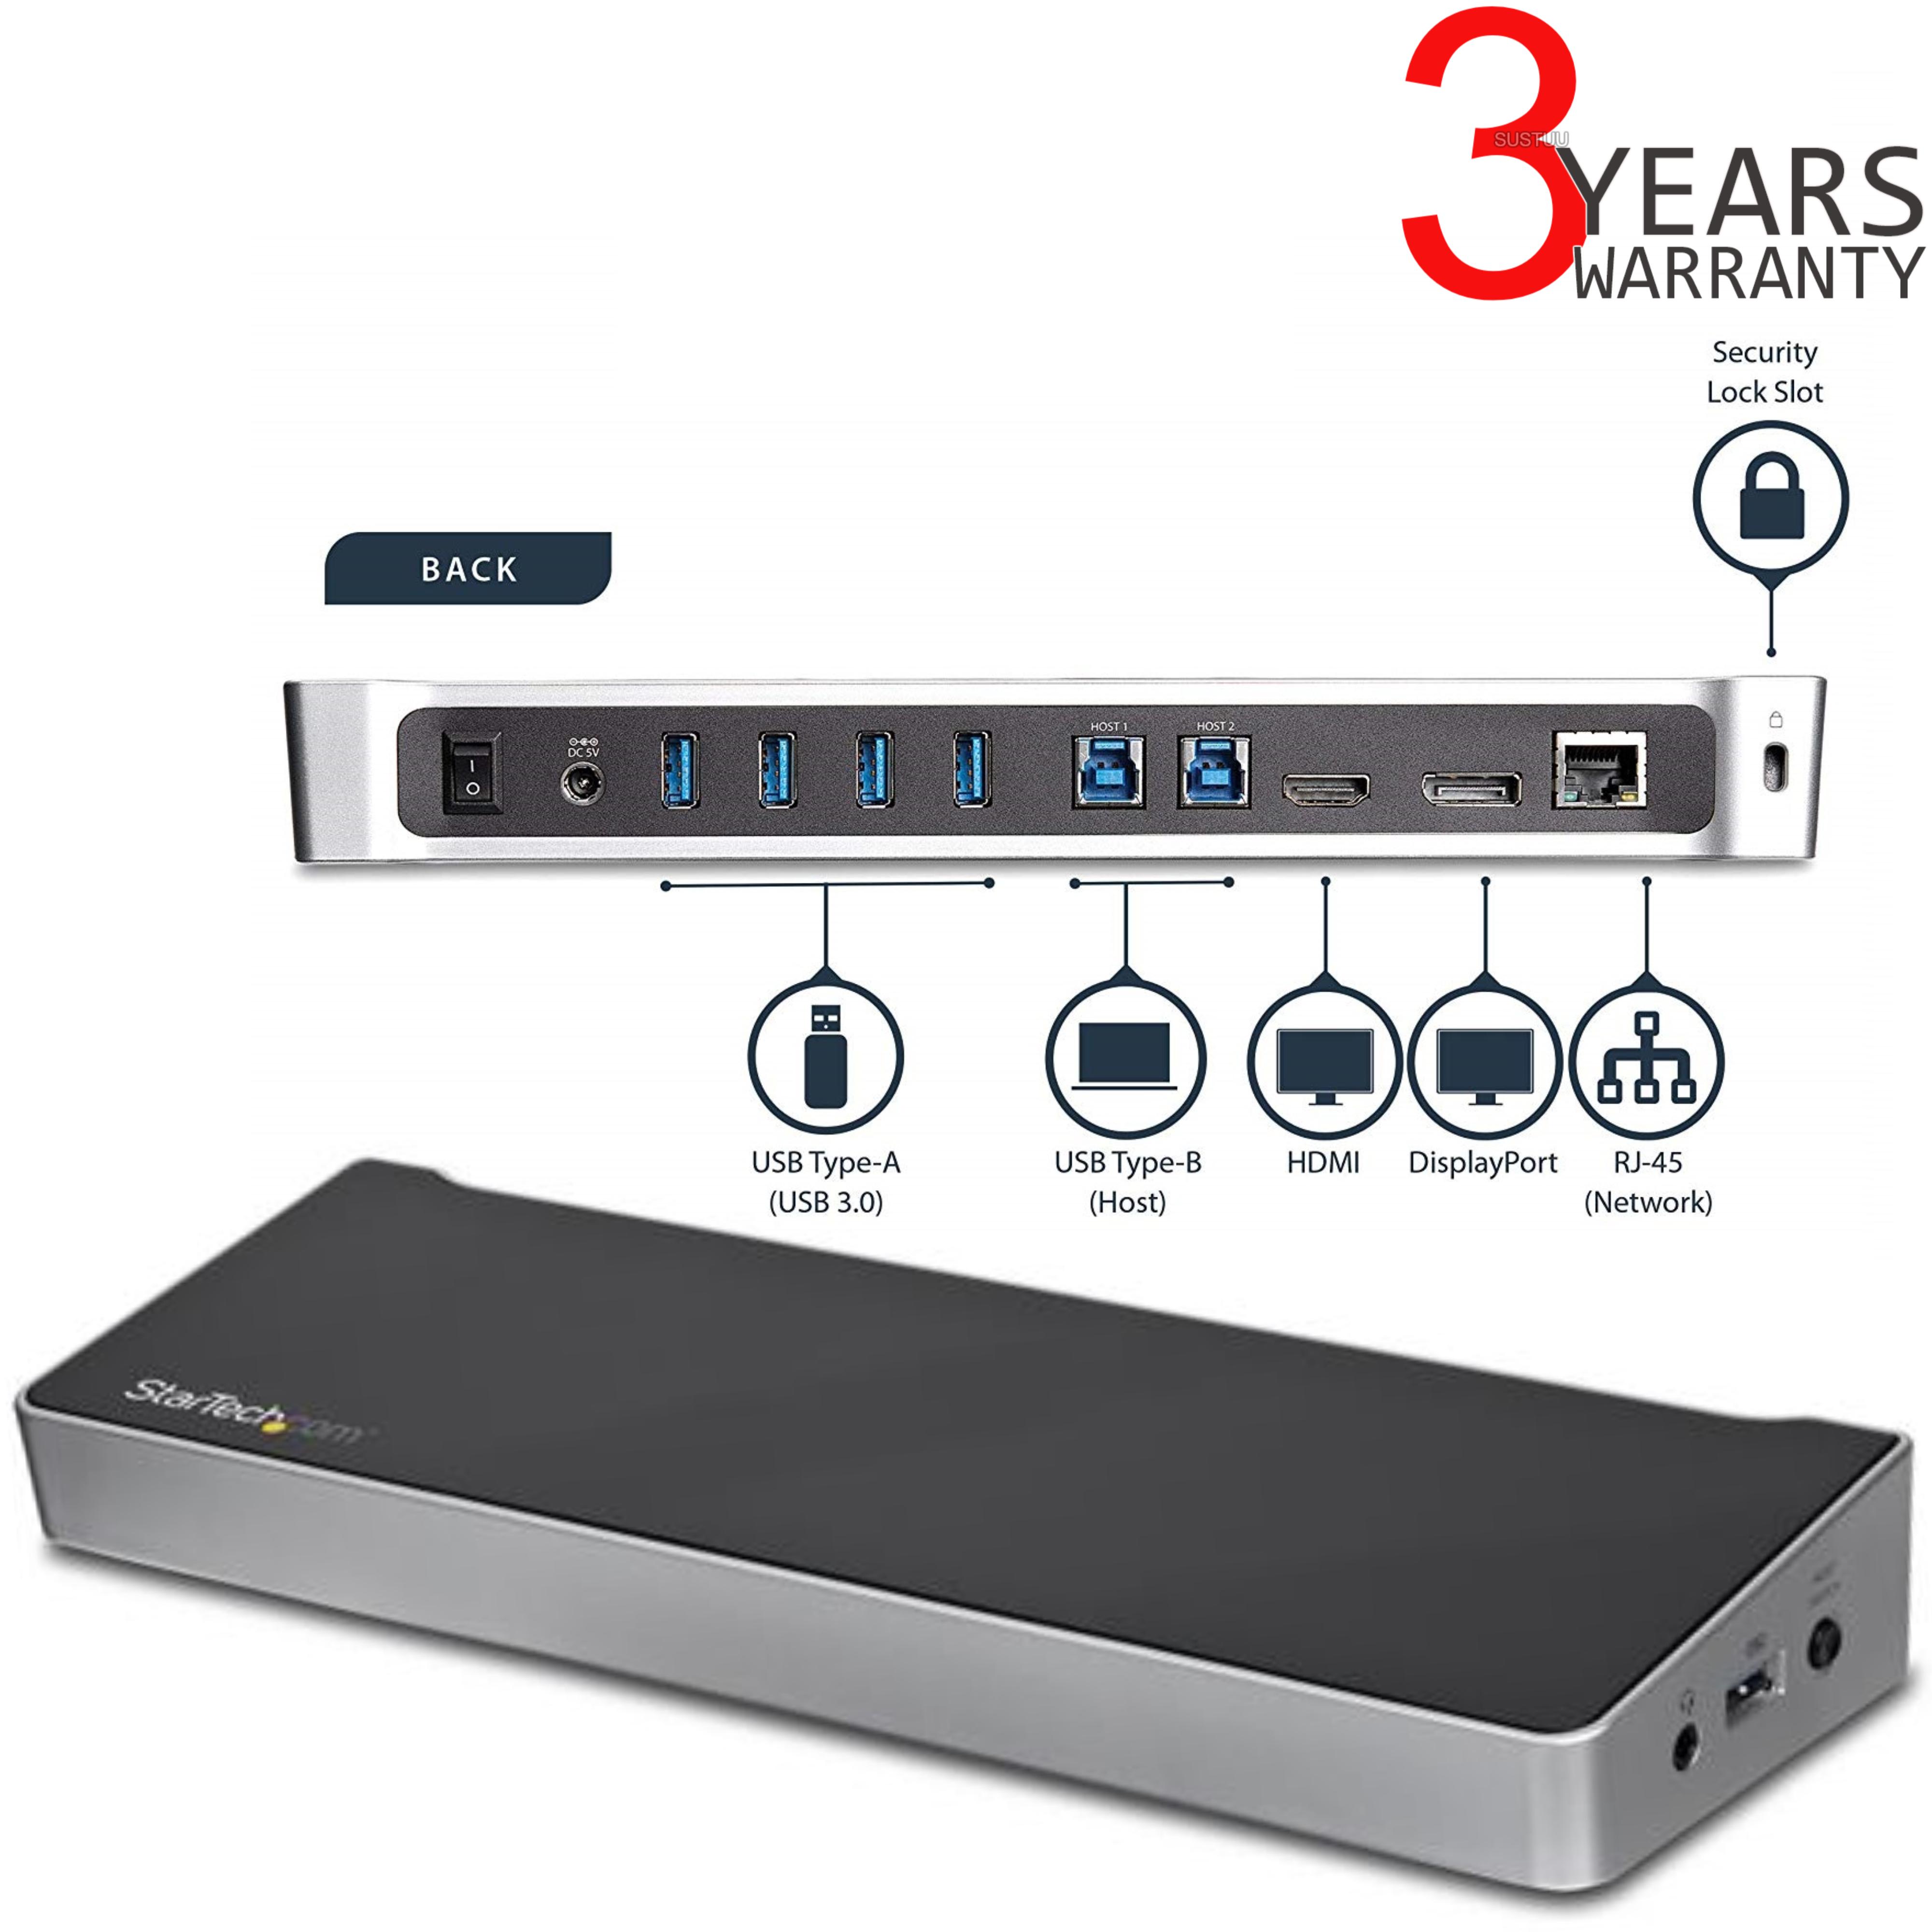 StarTech com Dual Monitor KVM USB 3 0 Docking Station for 2 Laptops | 5x  USB Ports